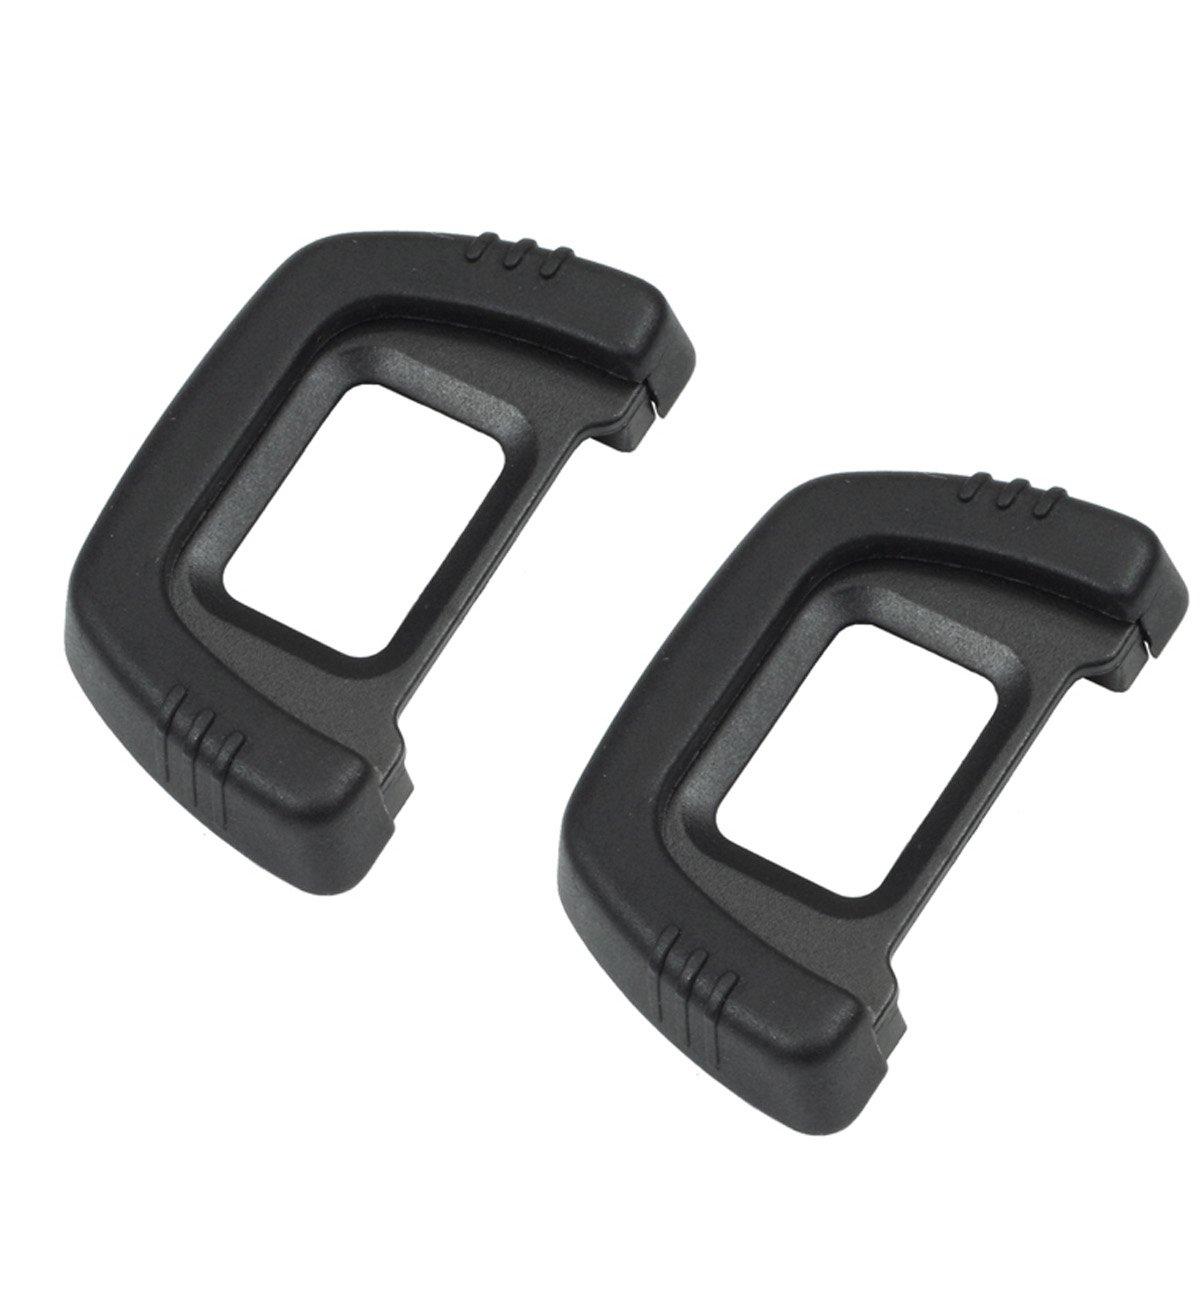 DK-23 Rubber Eyecup Eyepiece Viewfinder for Nikon D7100 D7200 D300 D300s DSLR Camera 2 Pack CEARI MicroFiber Clean Cloth